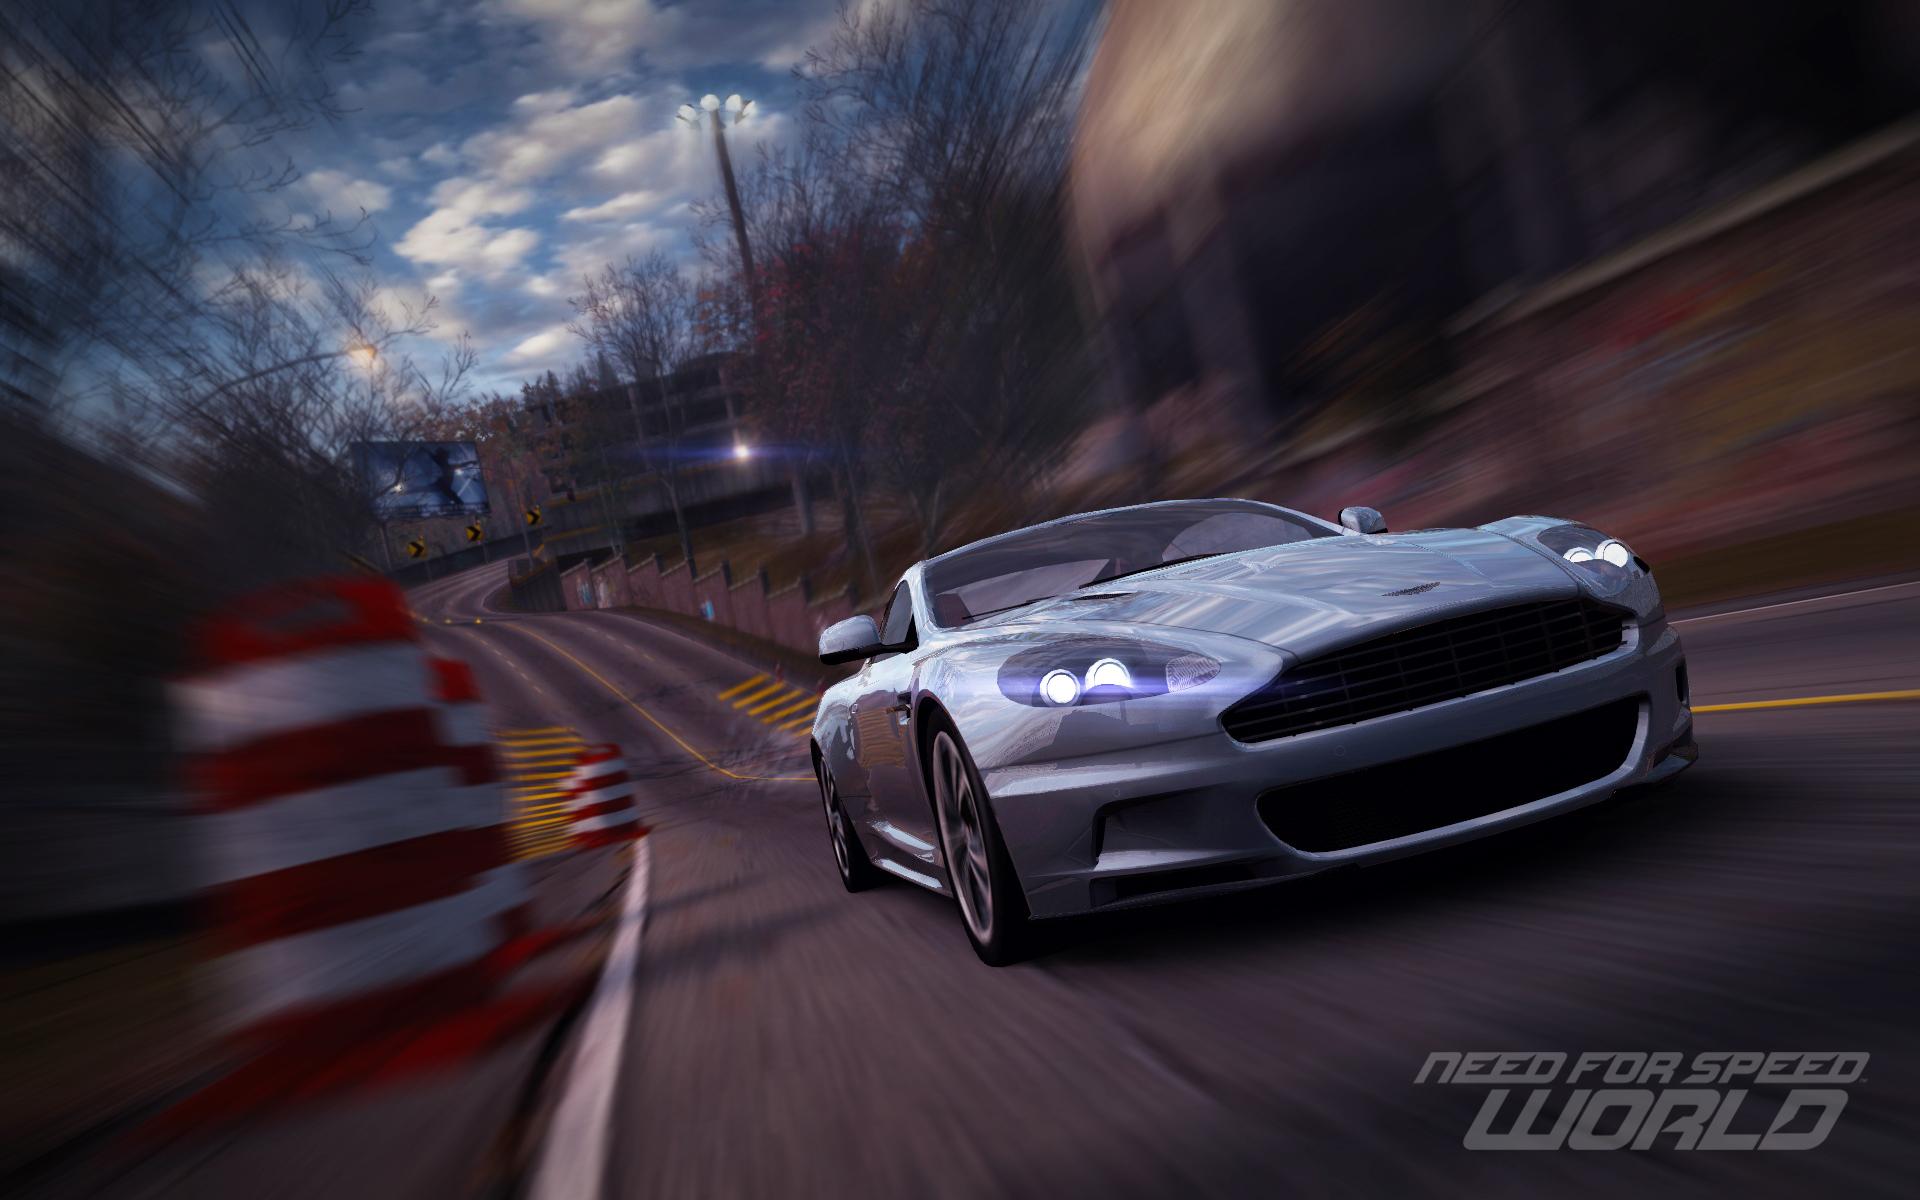 Image CarRelease Aston Martin DBS Blue 2